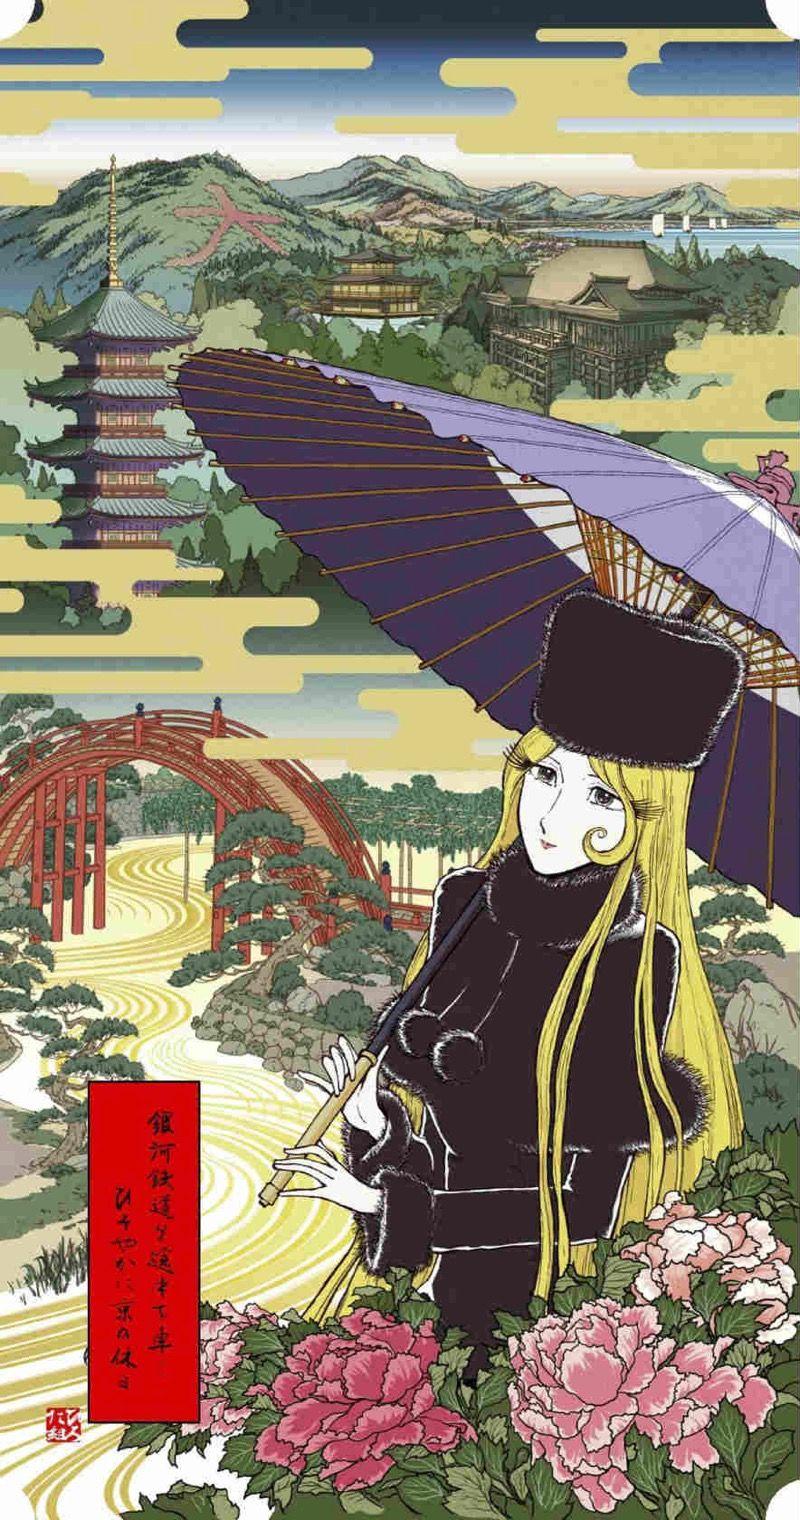 pin by ashley on 気になった絵 galaxy express japan culture art manga art